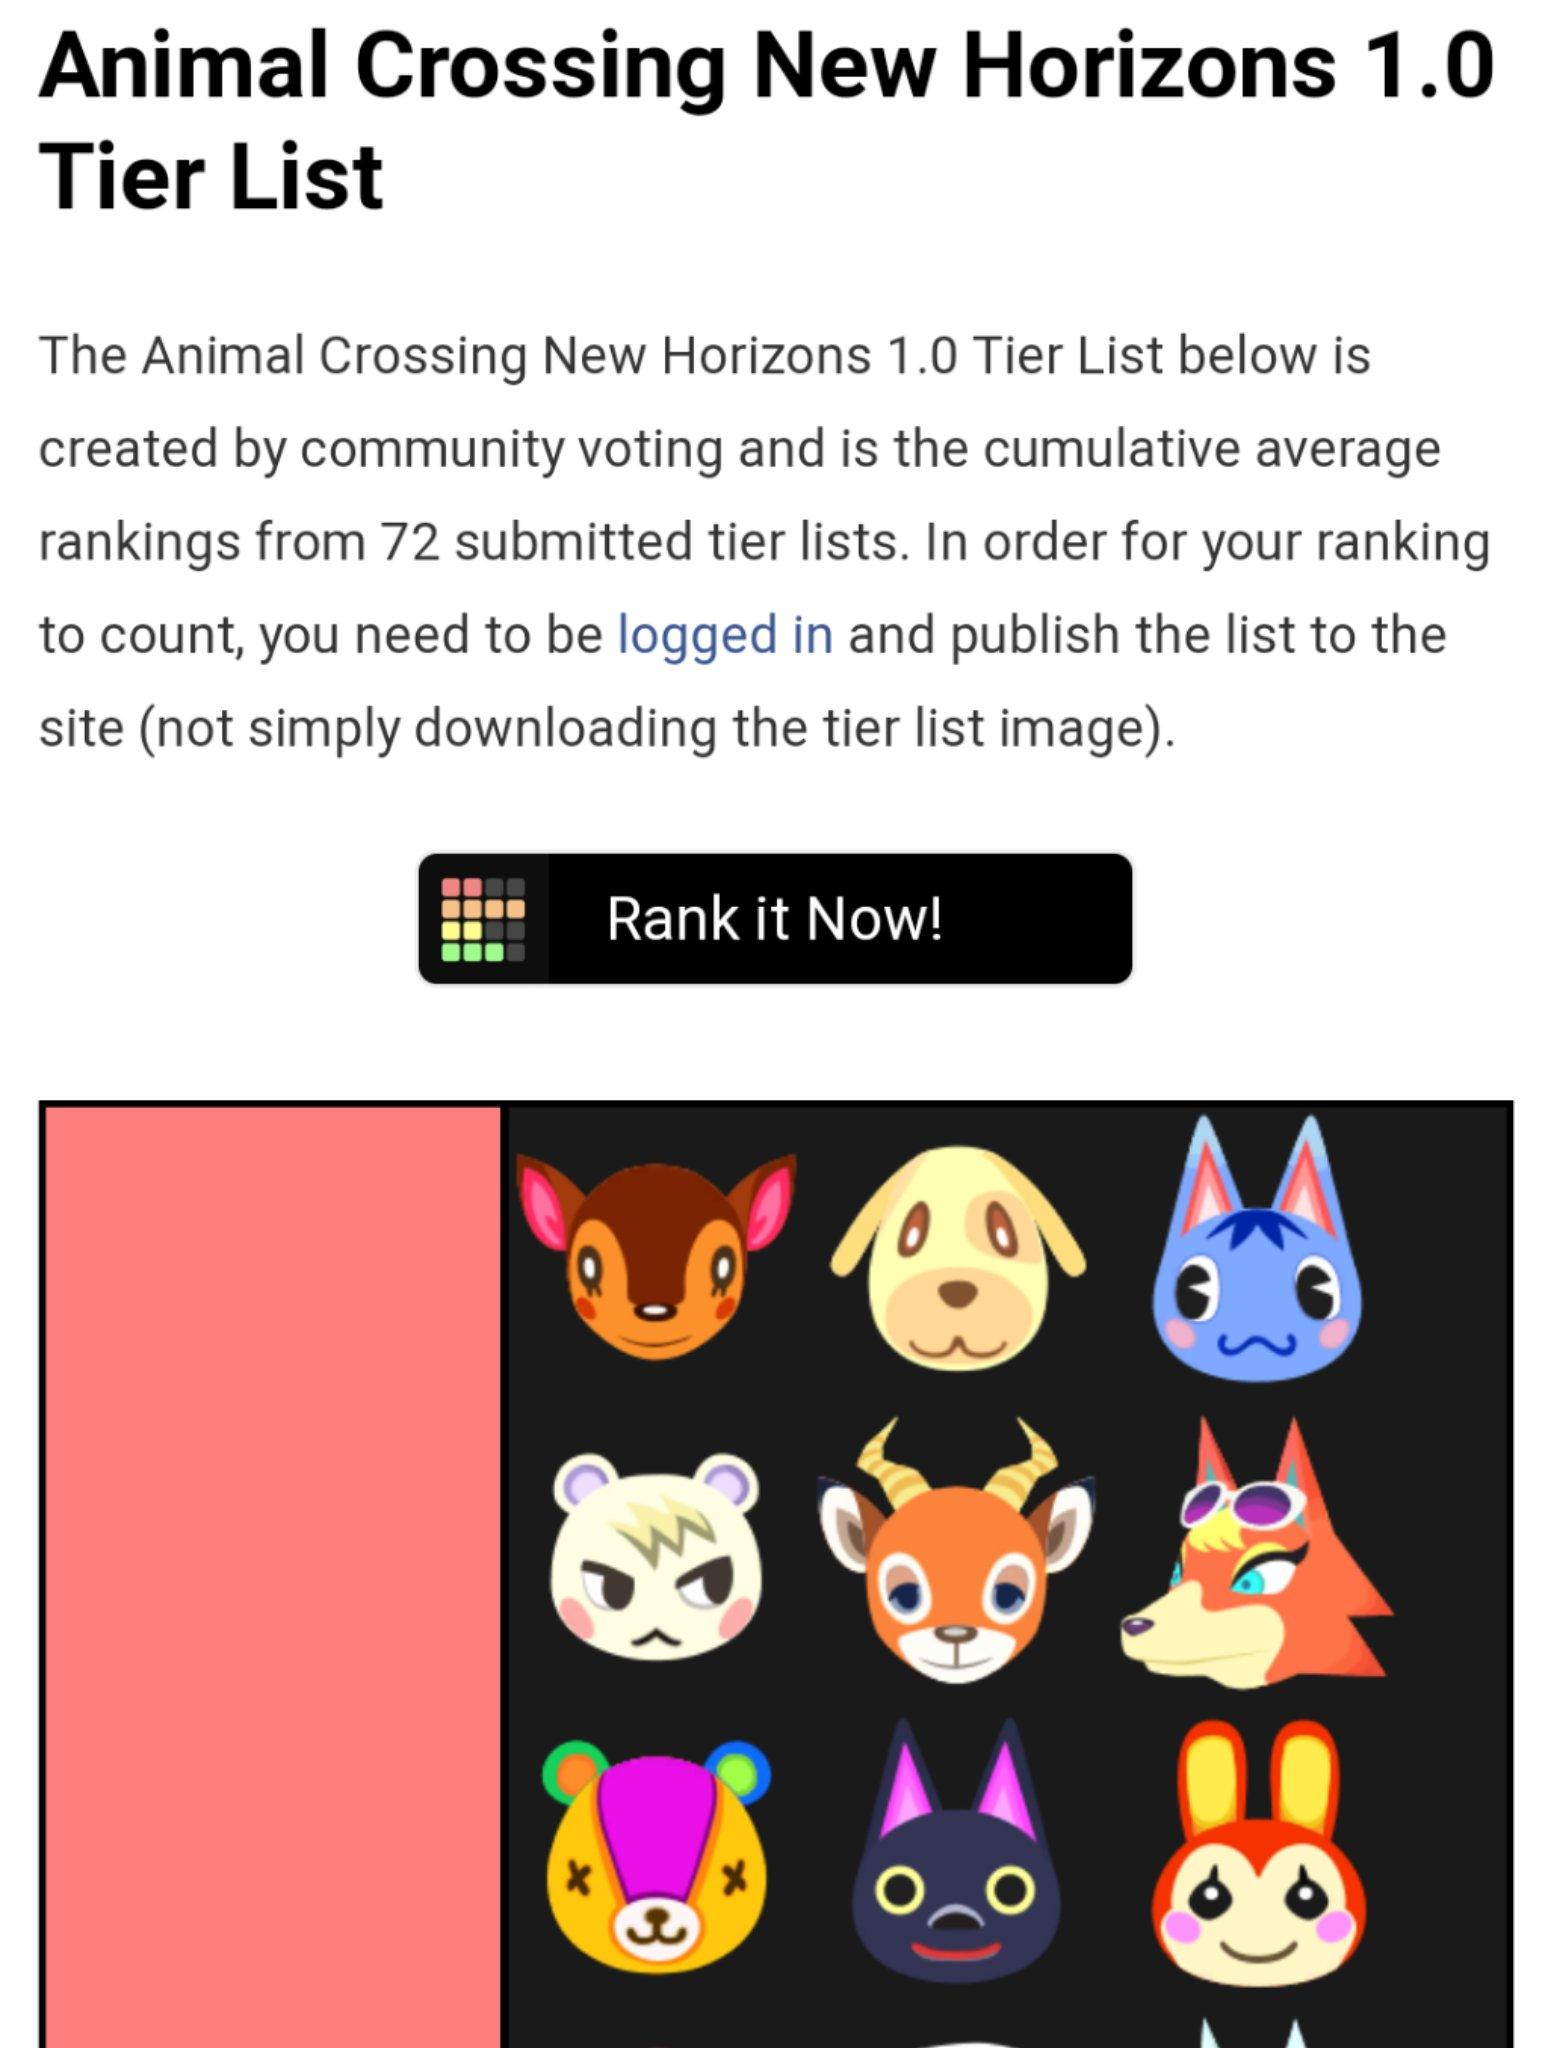 Tiermaker On Twitter Animal Crossing New Horizons 1 0 Community